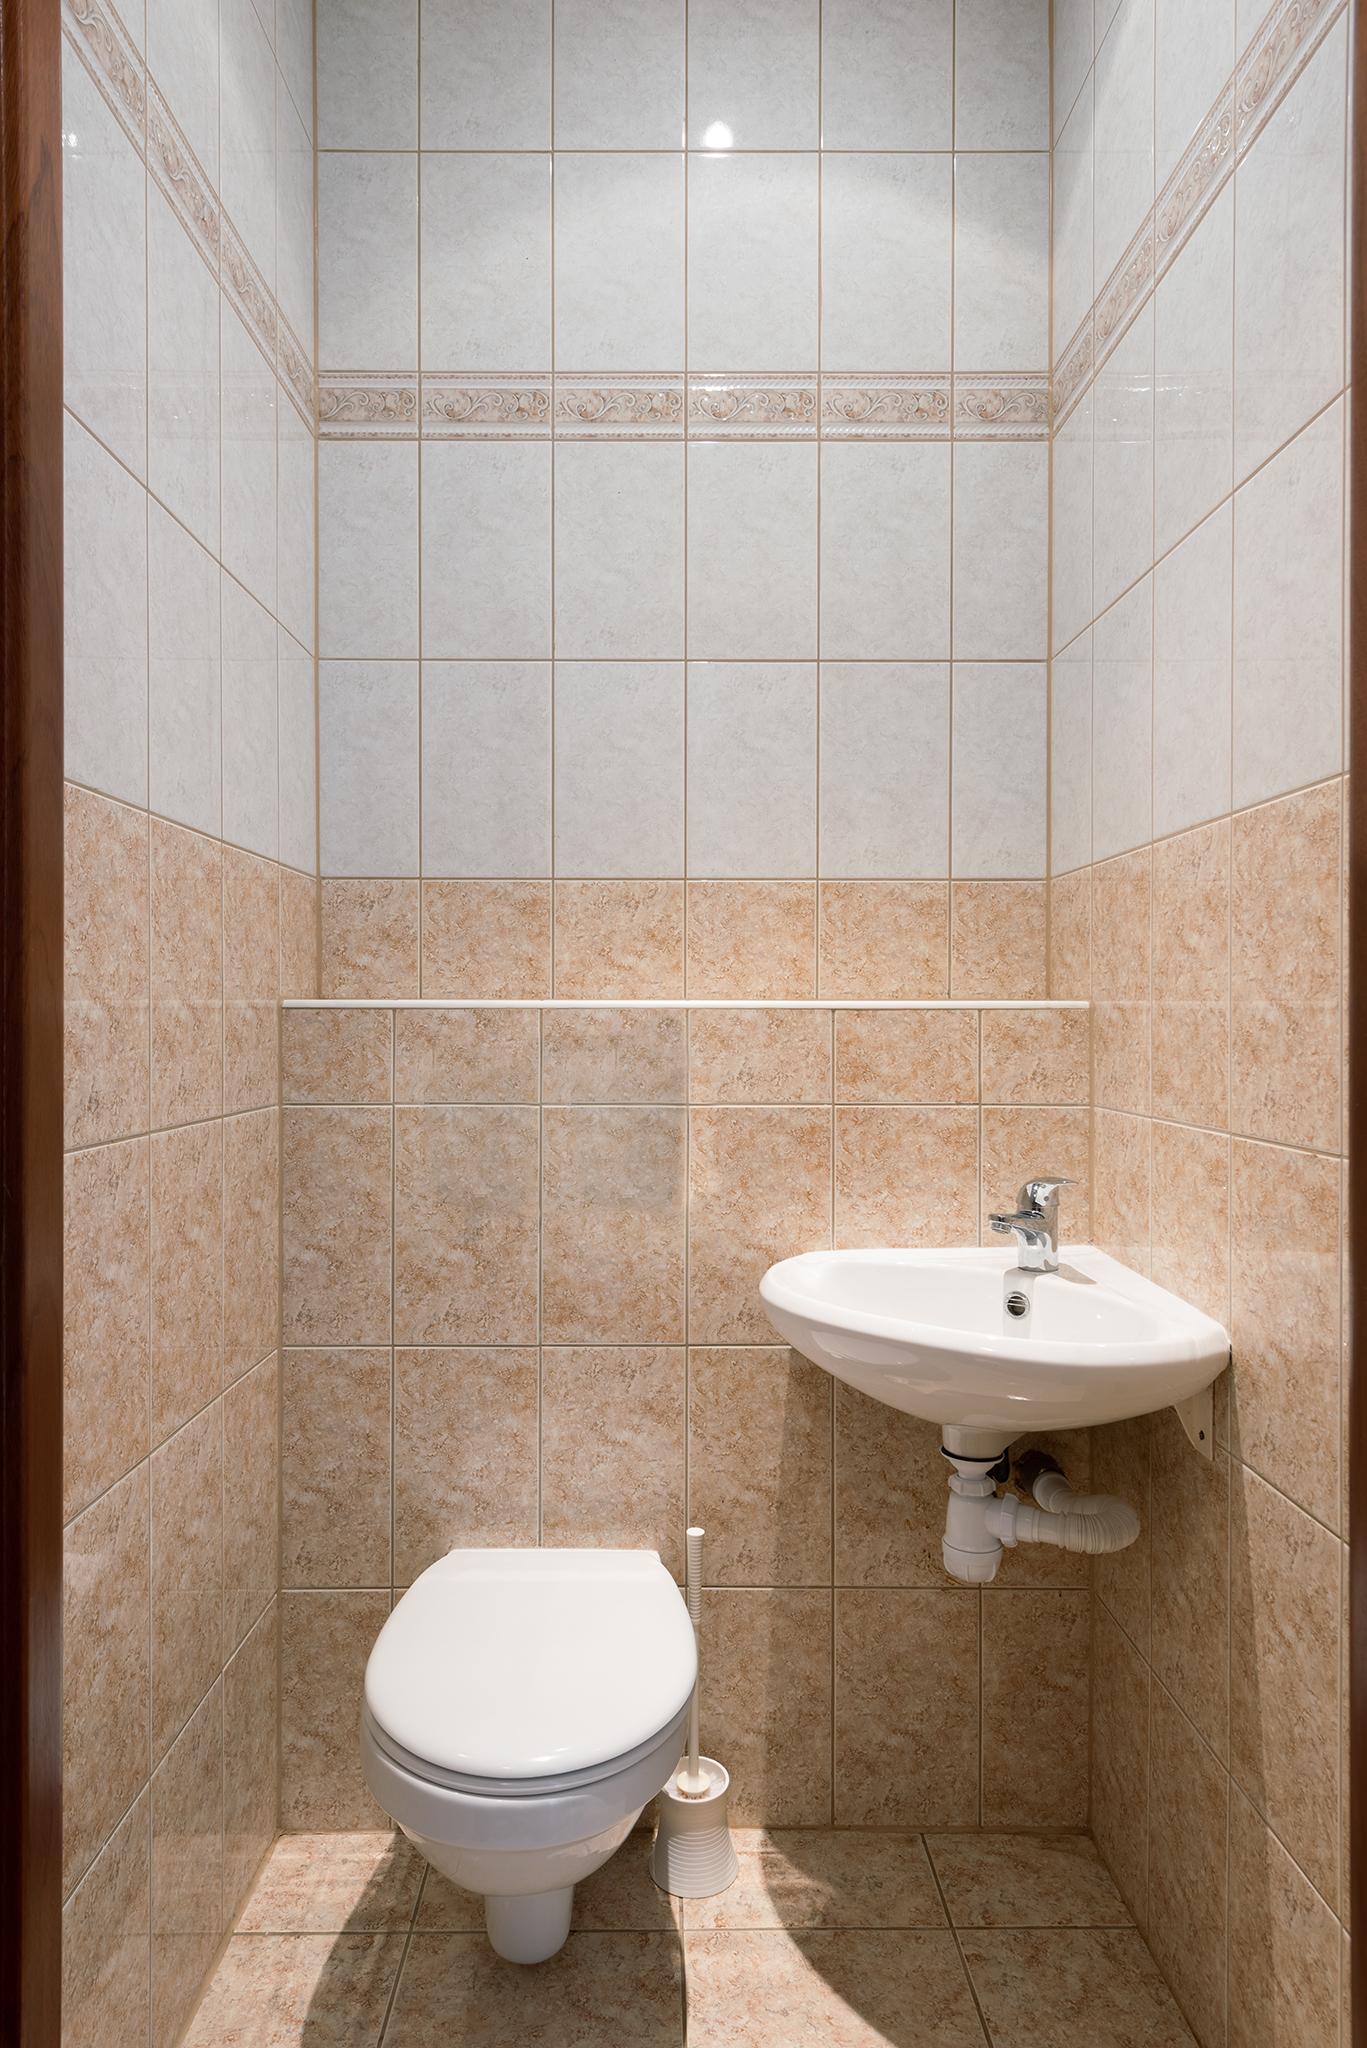 Investissement Immobilier Kiev, Ukraine -  Toilettes